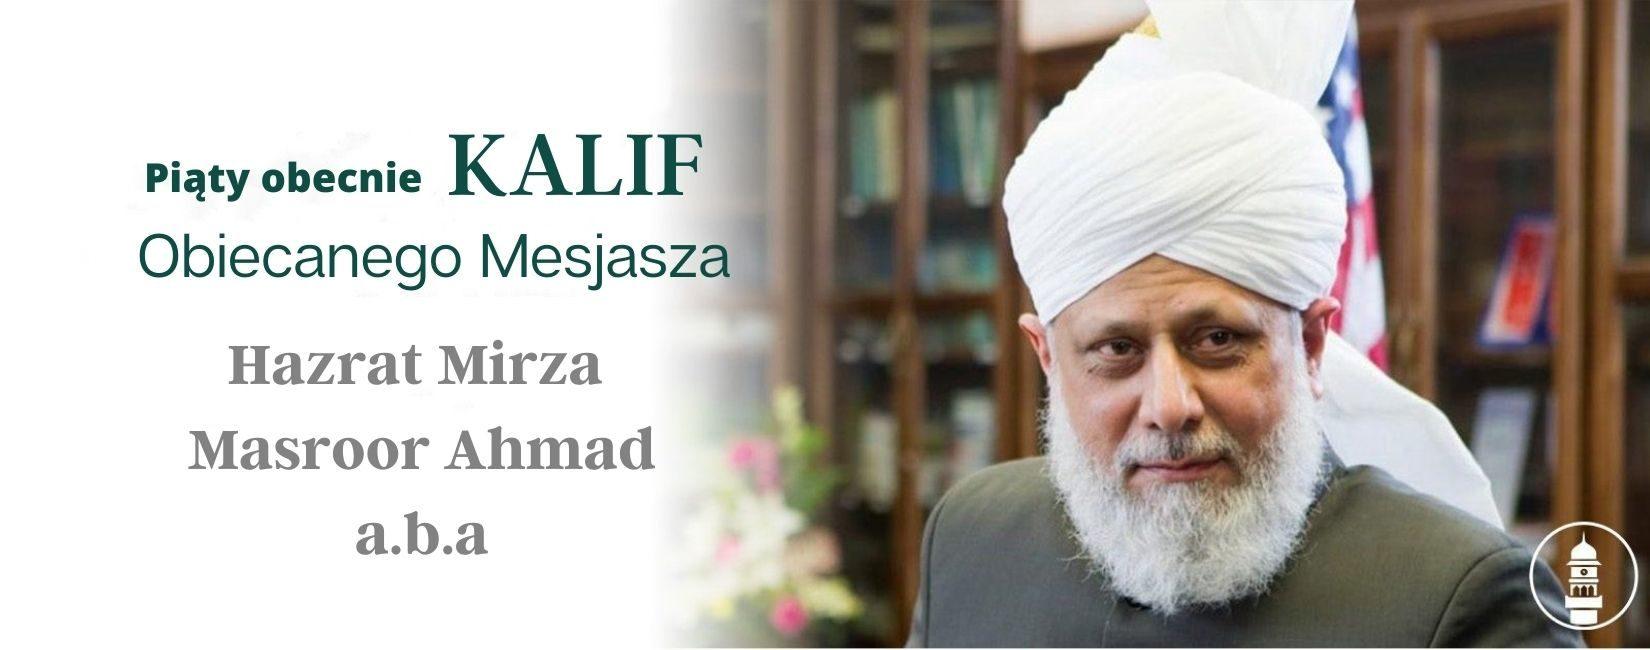 Hazrat Mirza Masroor Ahmad Khalifatul Masih V, Piąty Następca Obiecanego Mesjasza